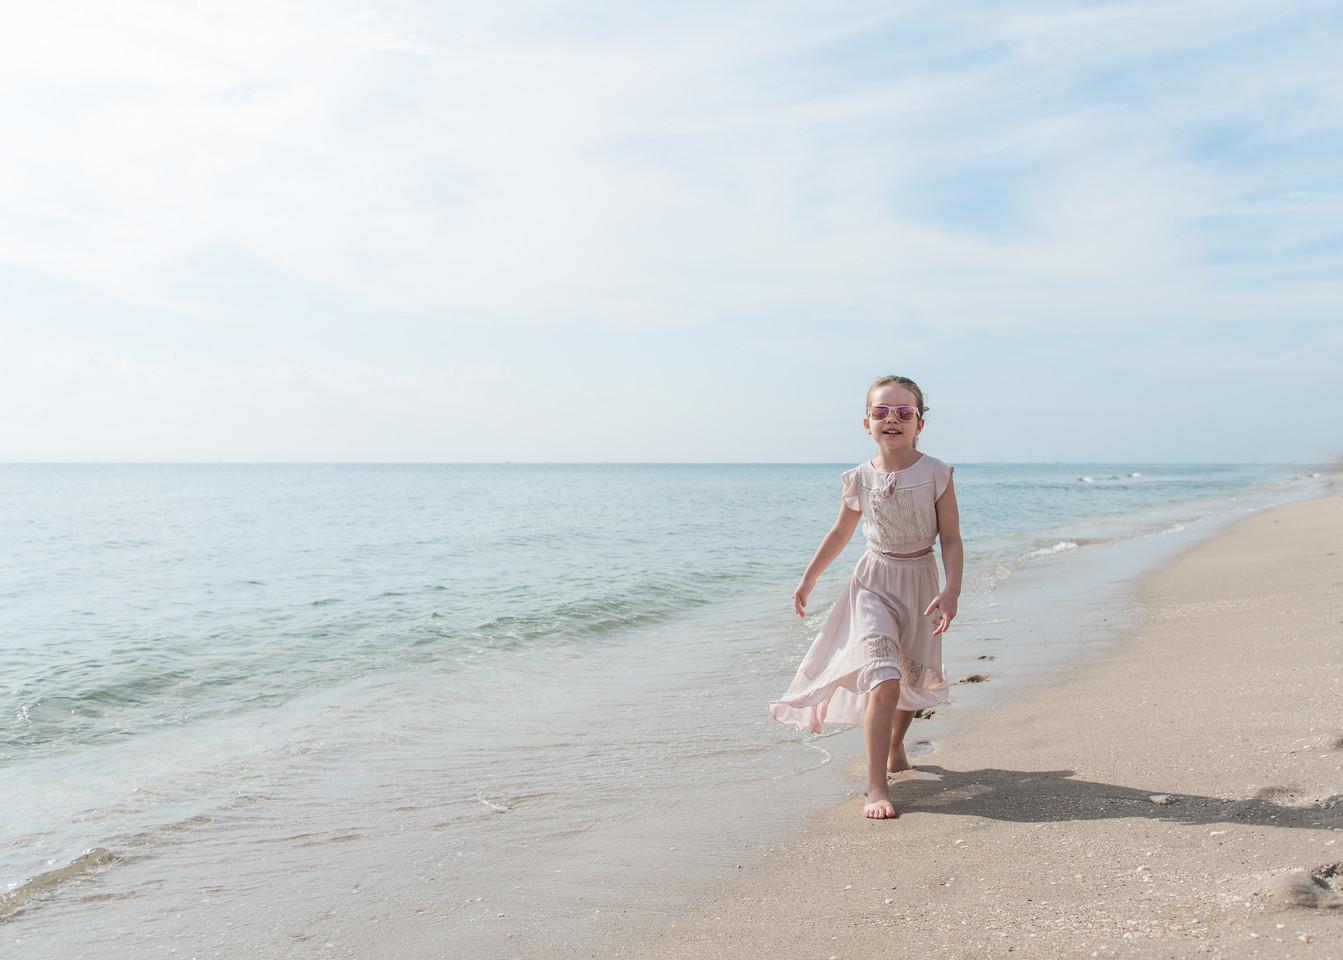 Florida_Beach_Photographer_-_Lily-17.jpg